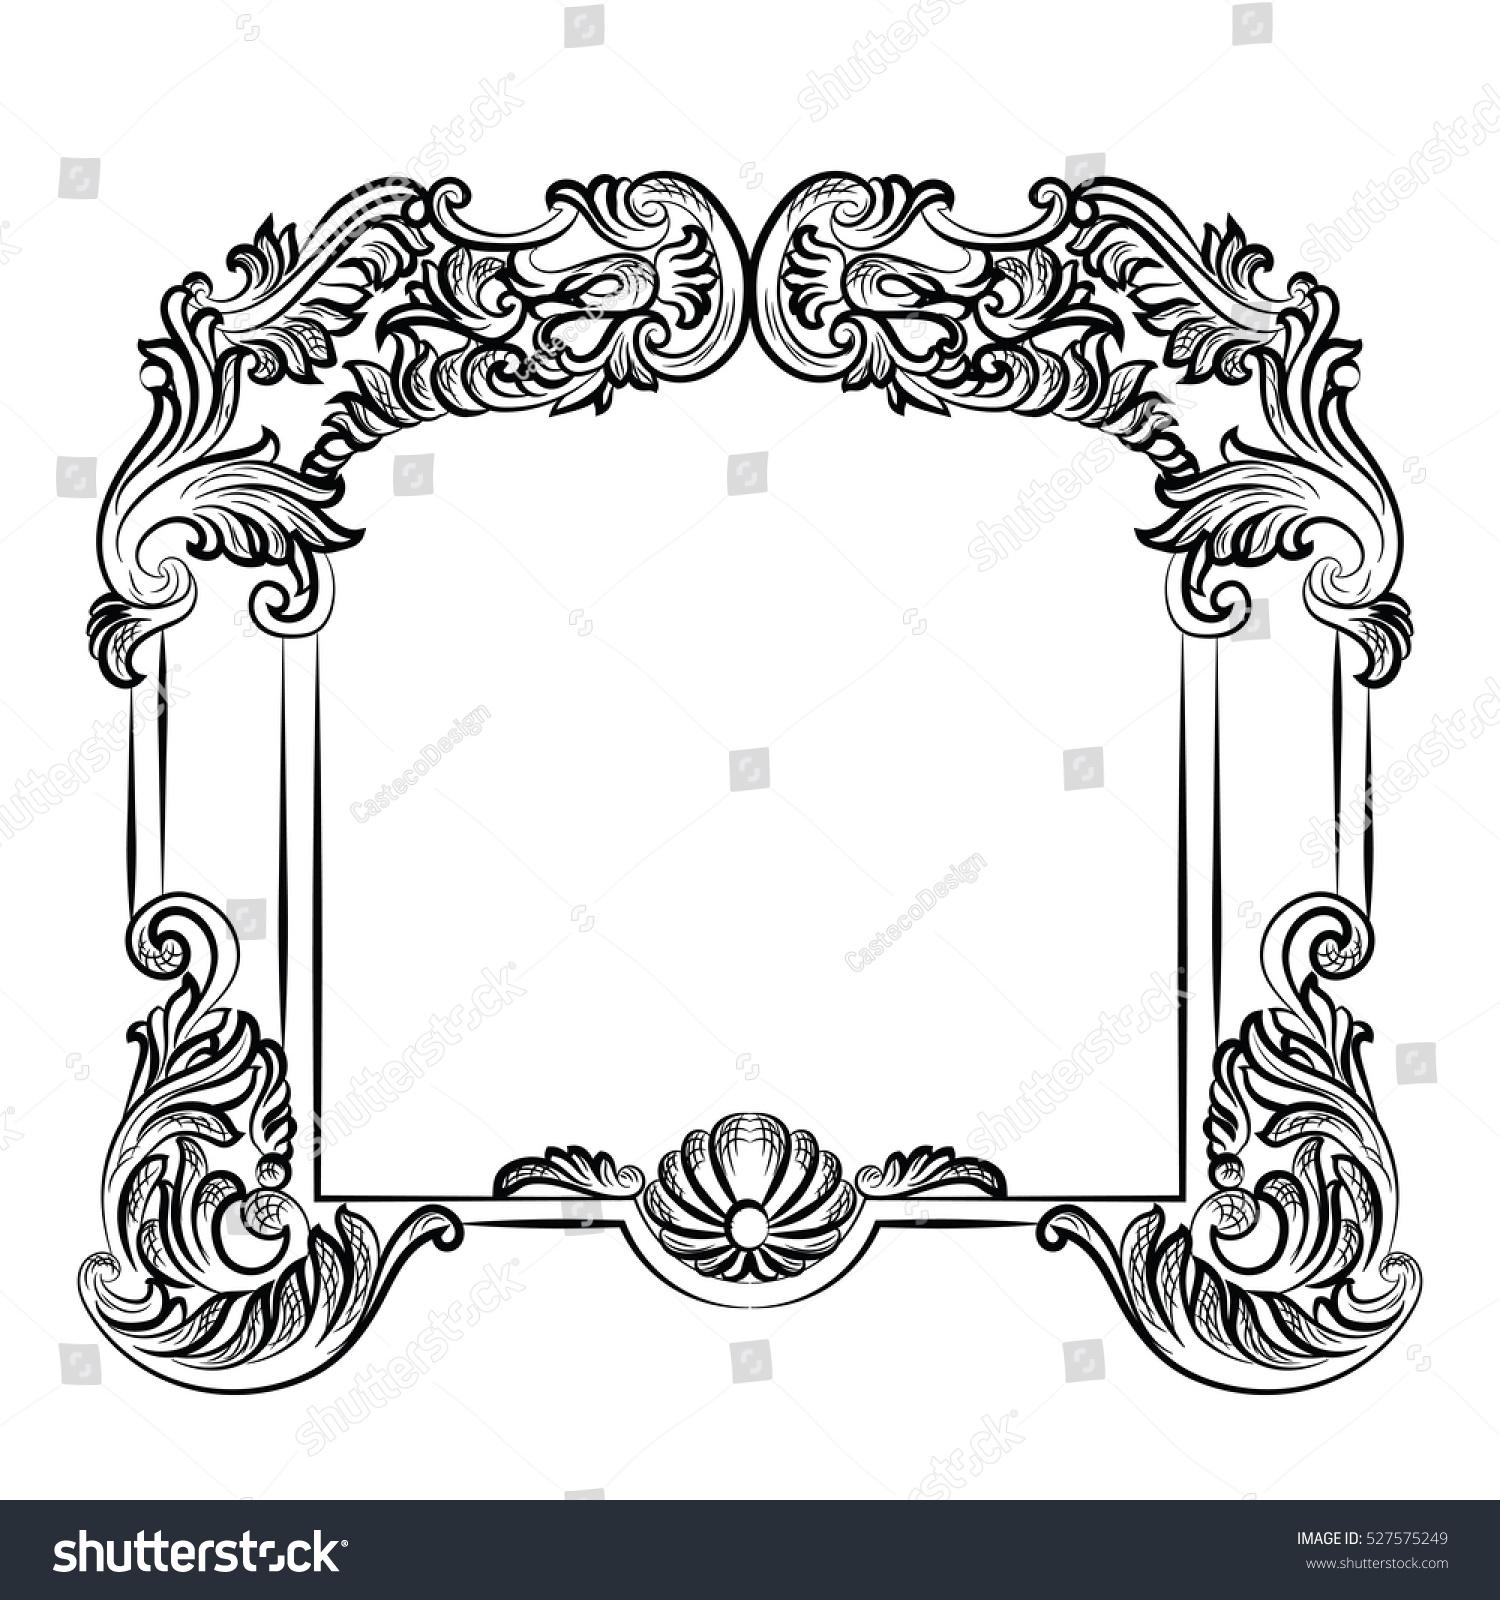 Wilko baroque mirror silver 87x62cm -  Imperial Baroque Mirror Frame Vector French Stock Vector 527575249